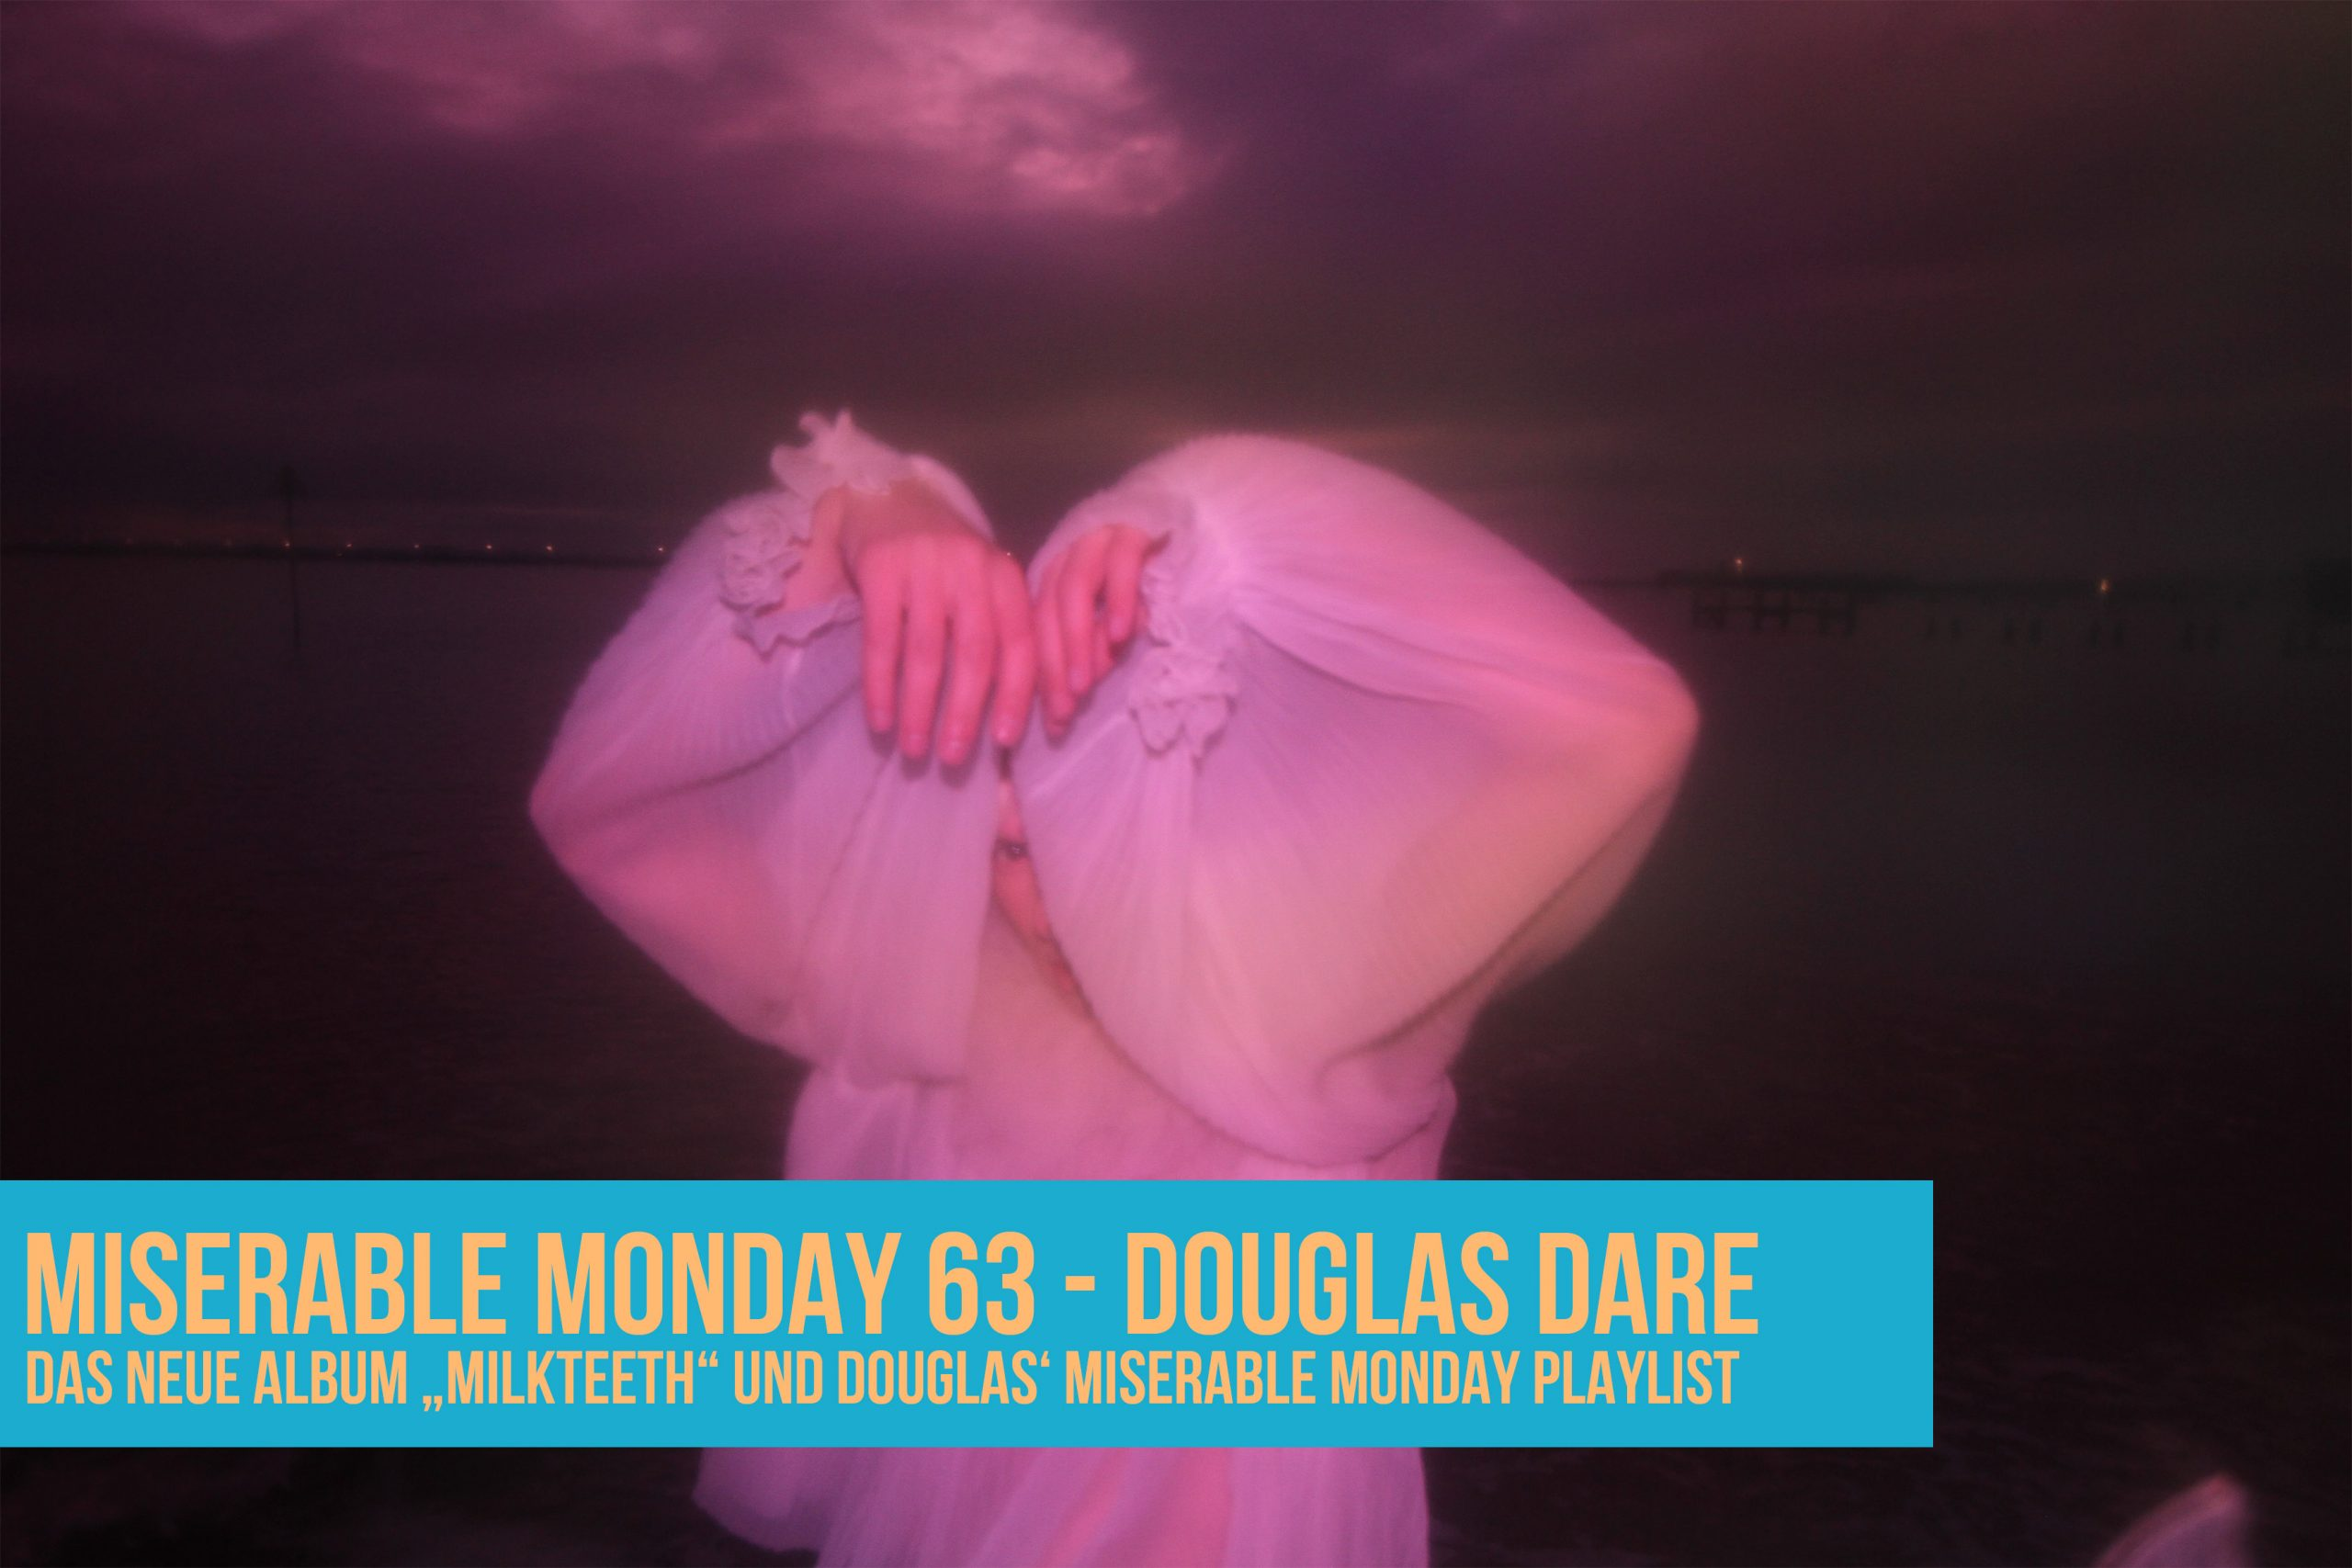 63 - Douglas Dare